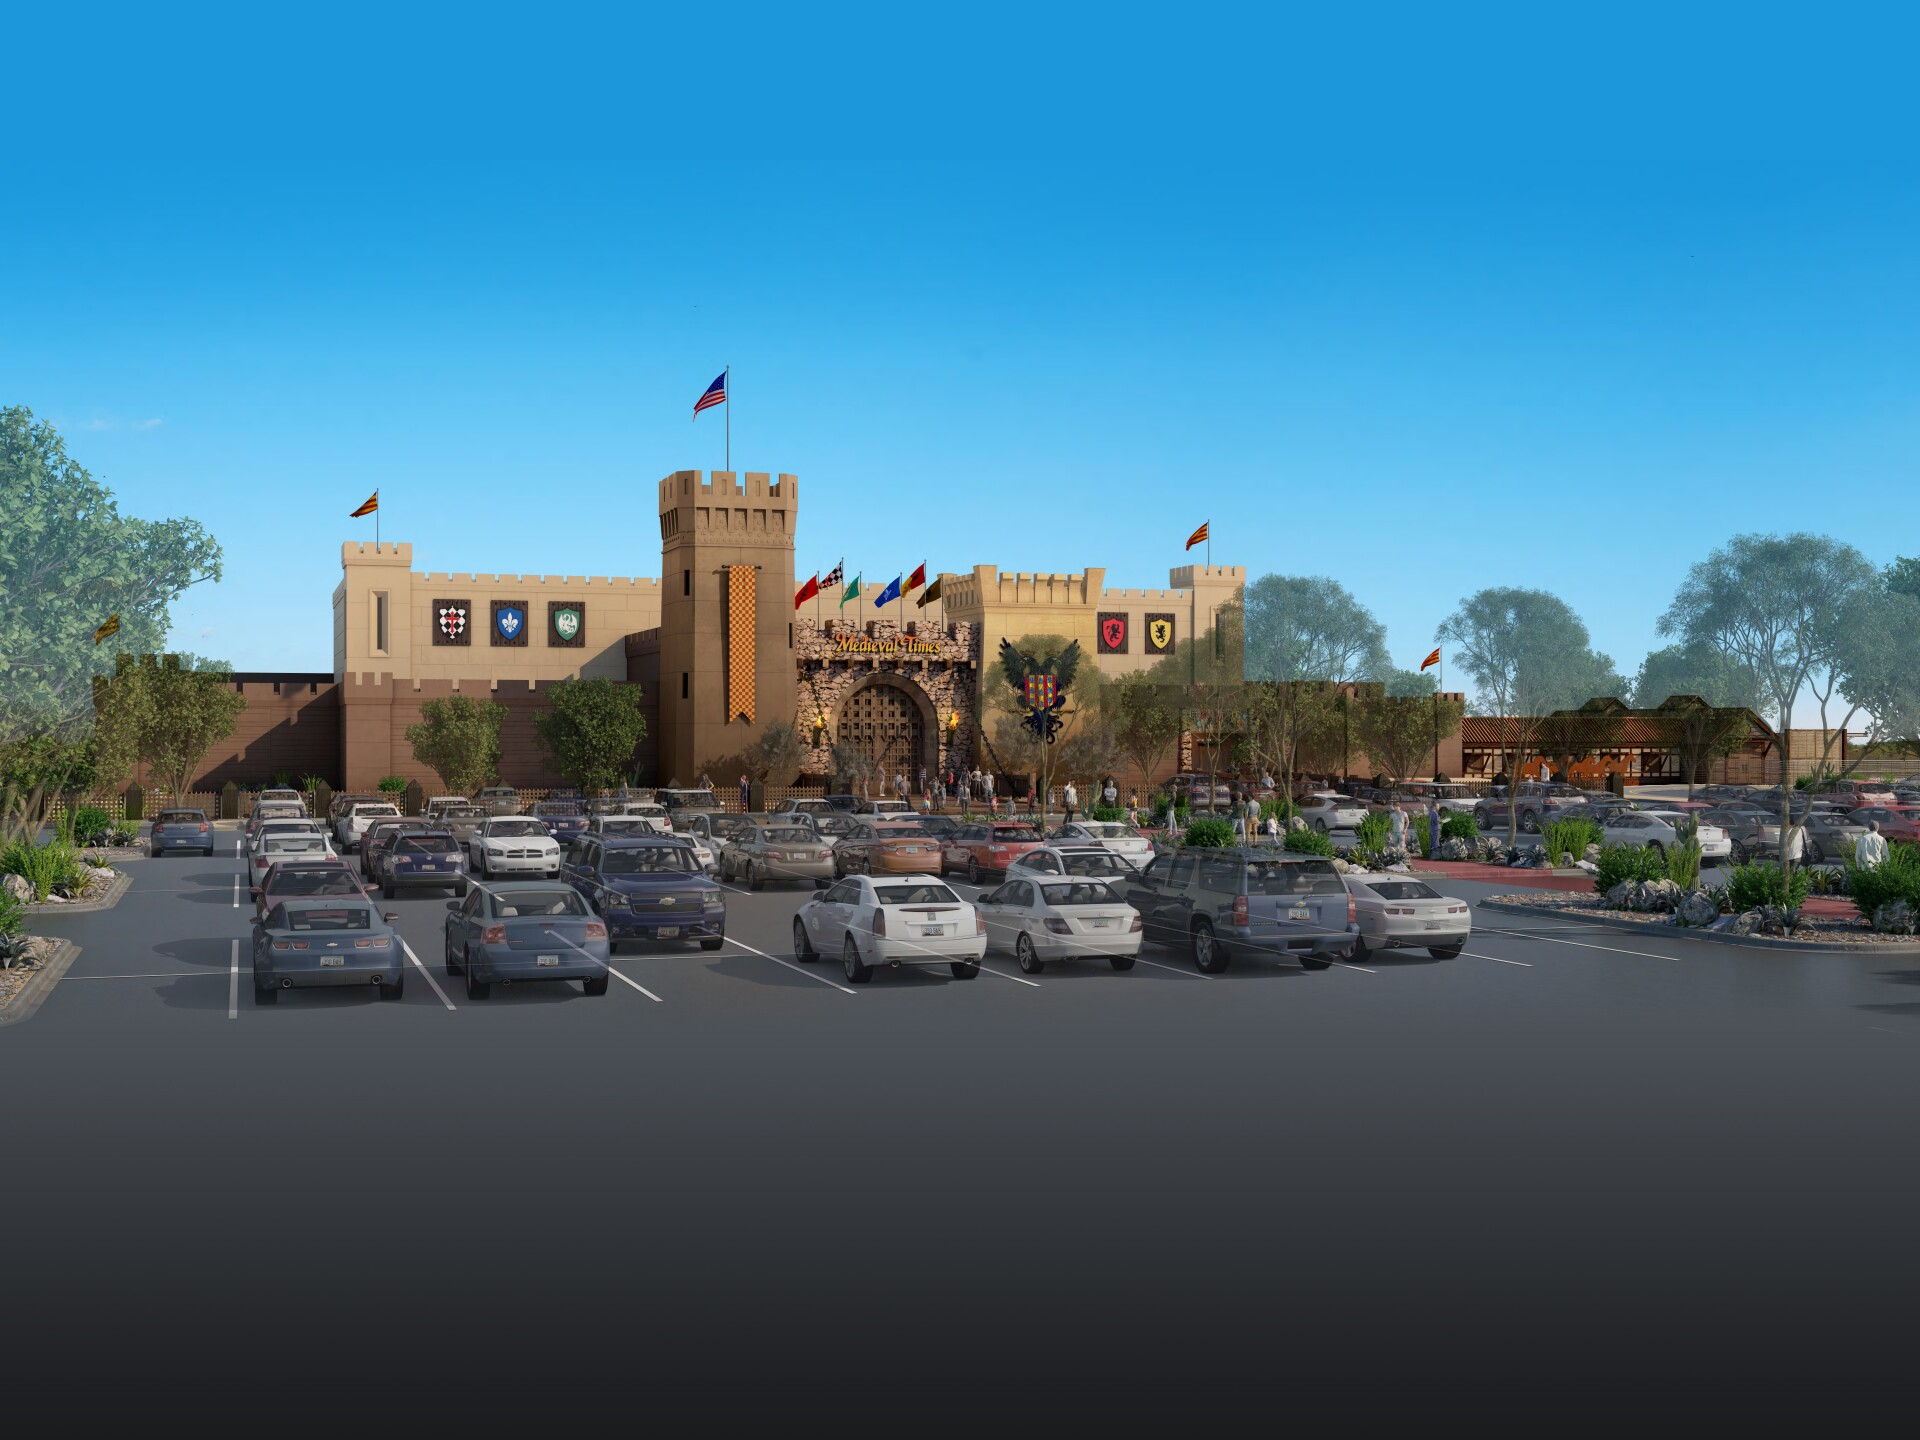 AZ_castle front rendering (1).jpg